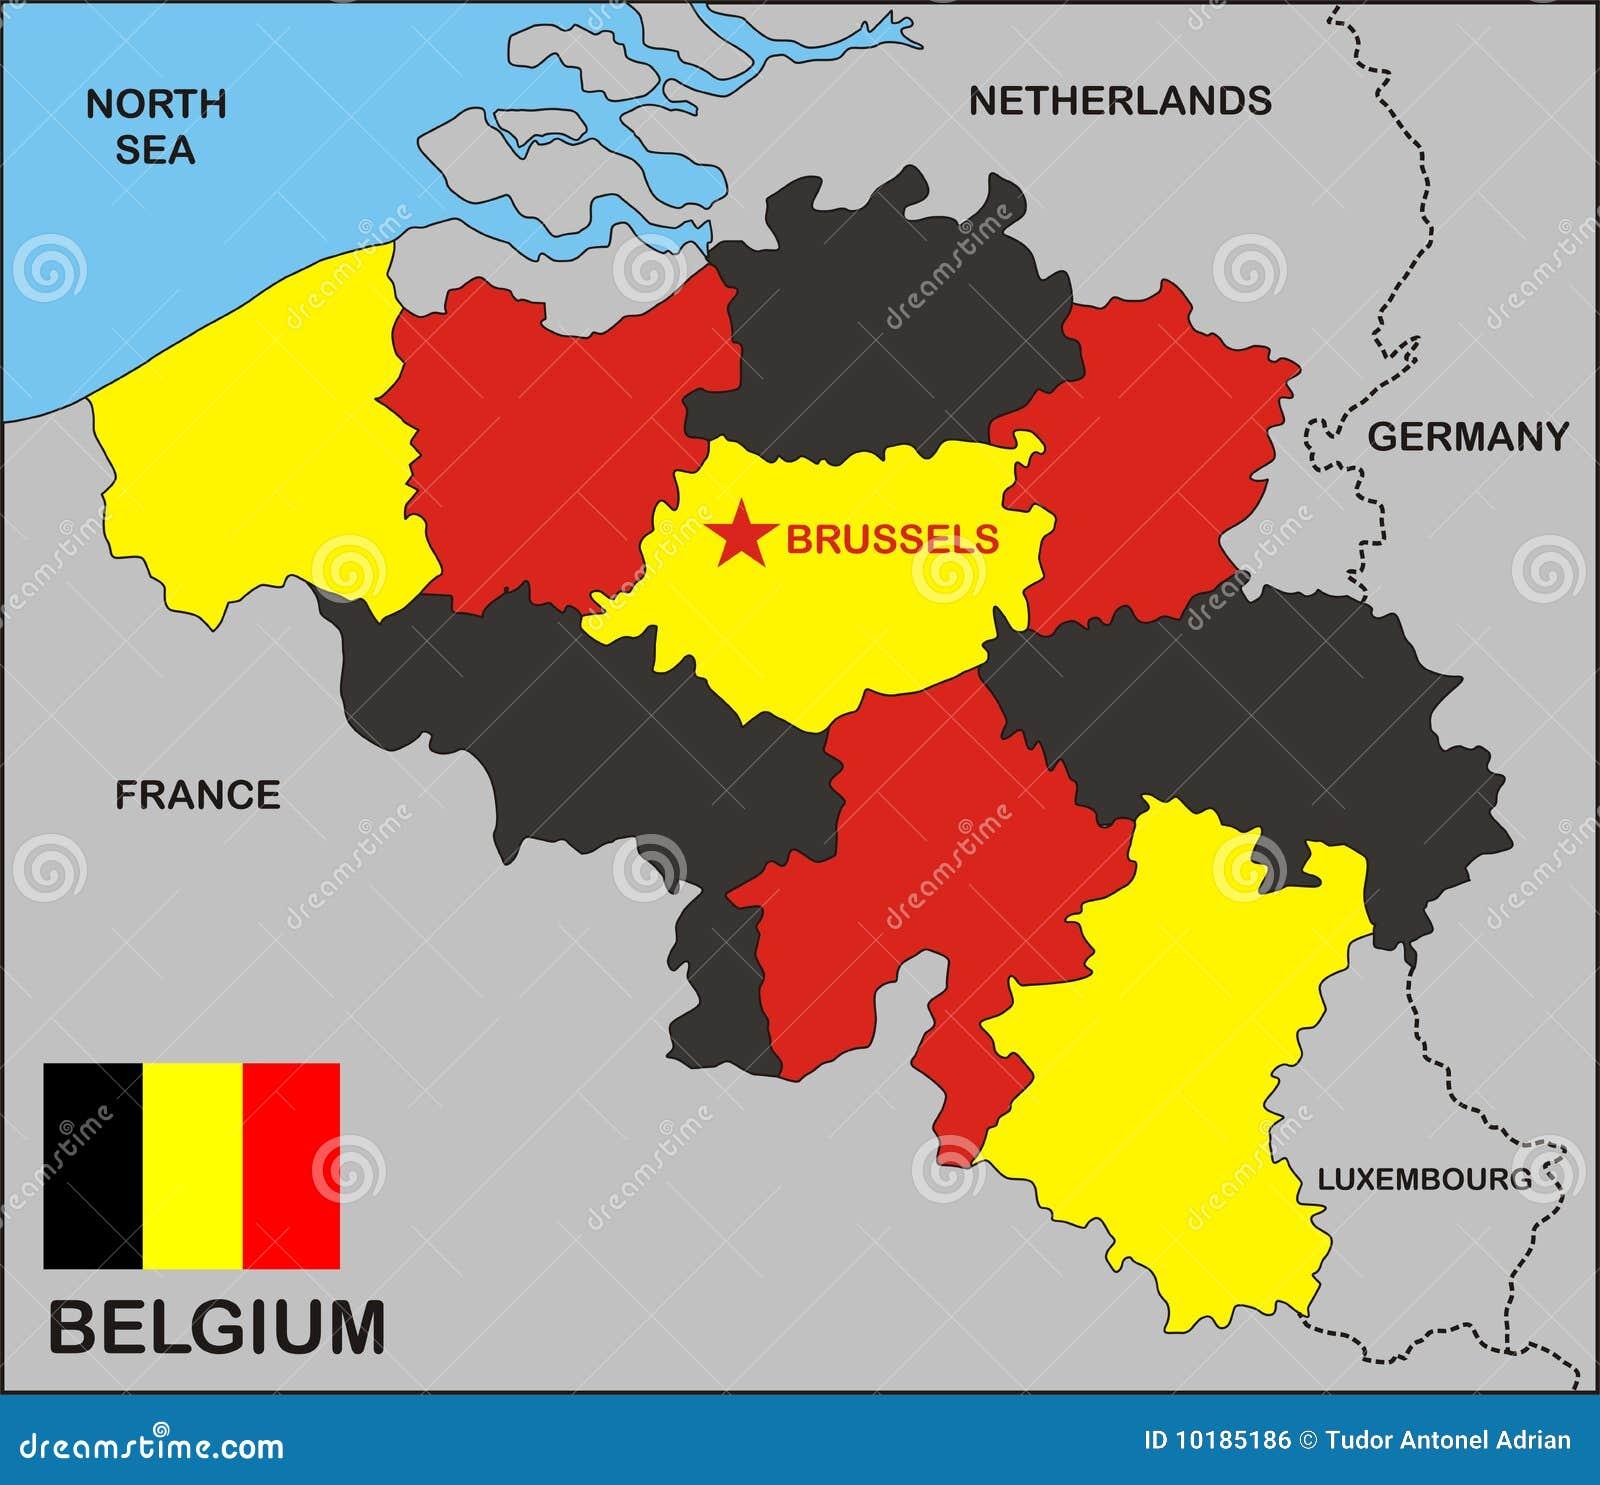 Belgium Political Map Photos Images and Pictures 250 Images – Belgium Political Map